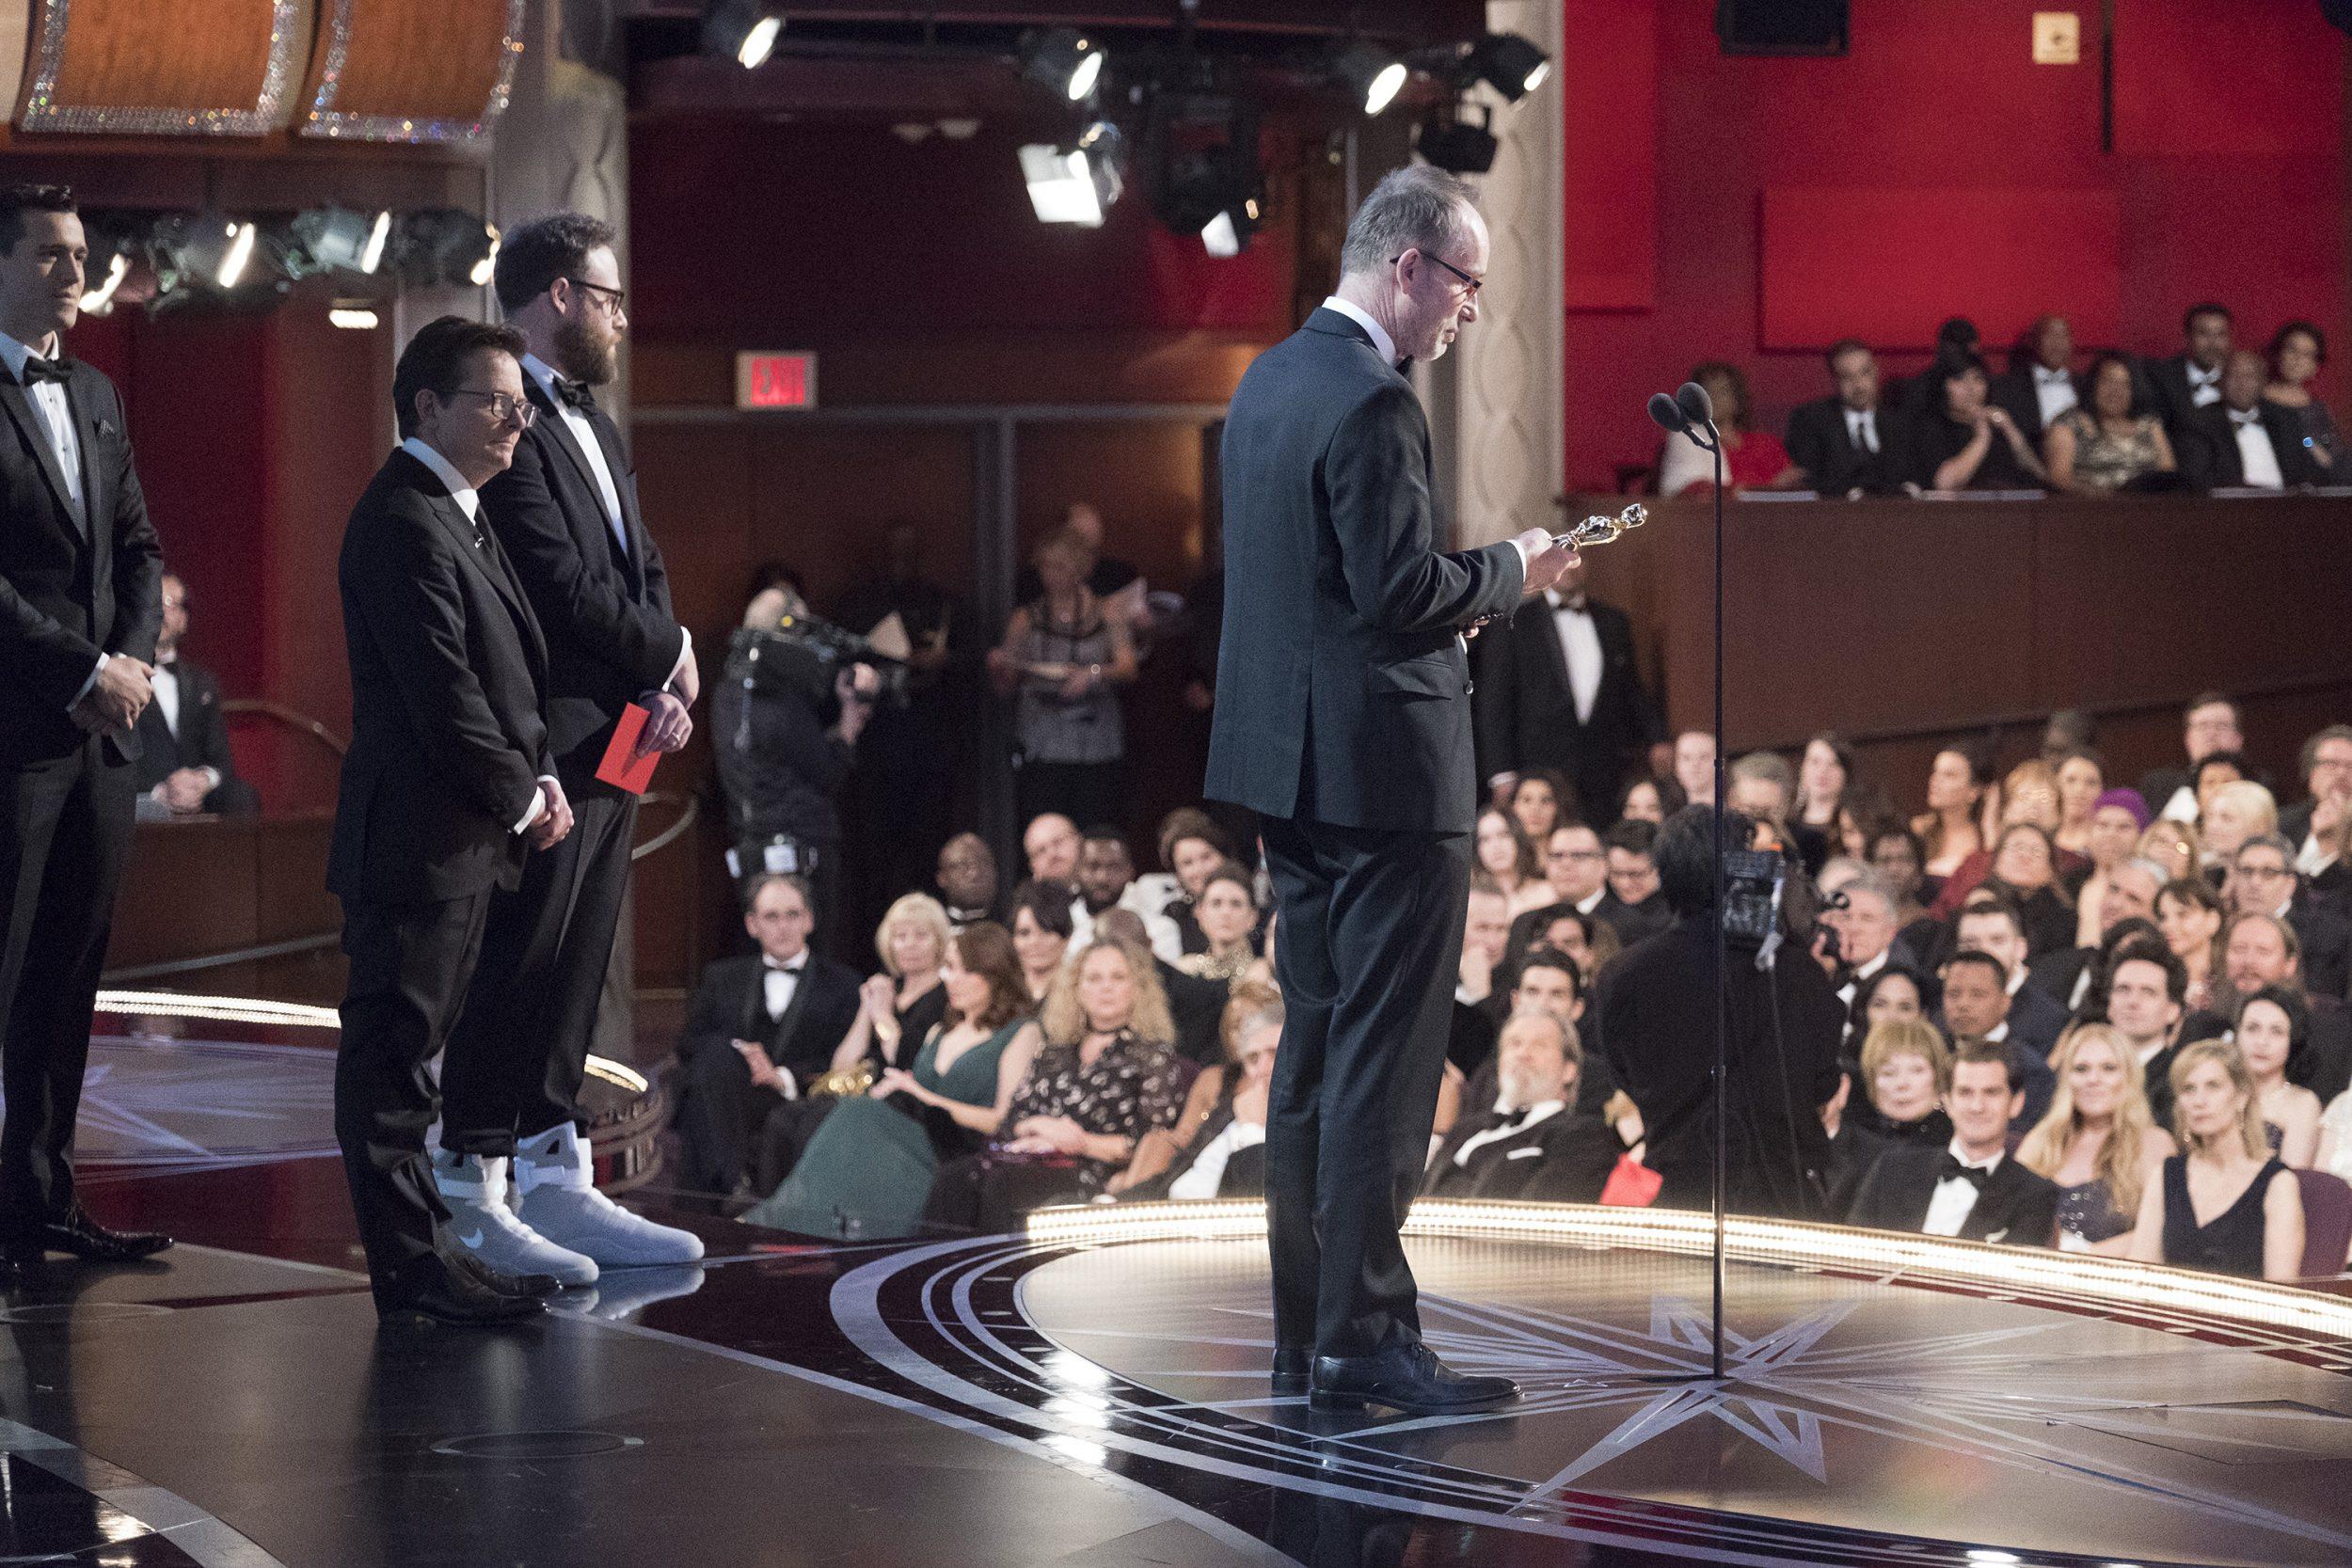 THE OSCARS(r) - The 89th Oscars(r)  broadcasts live on Oscar(r) SUNDAY, FEBRUARY 26, 2017, on the ABC Television Network. (ABC/Adam Rose) MICHAEL J. FOX, SETH ROGEN, JOHN GILBERT